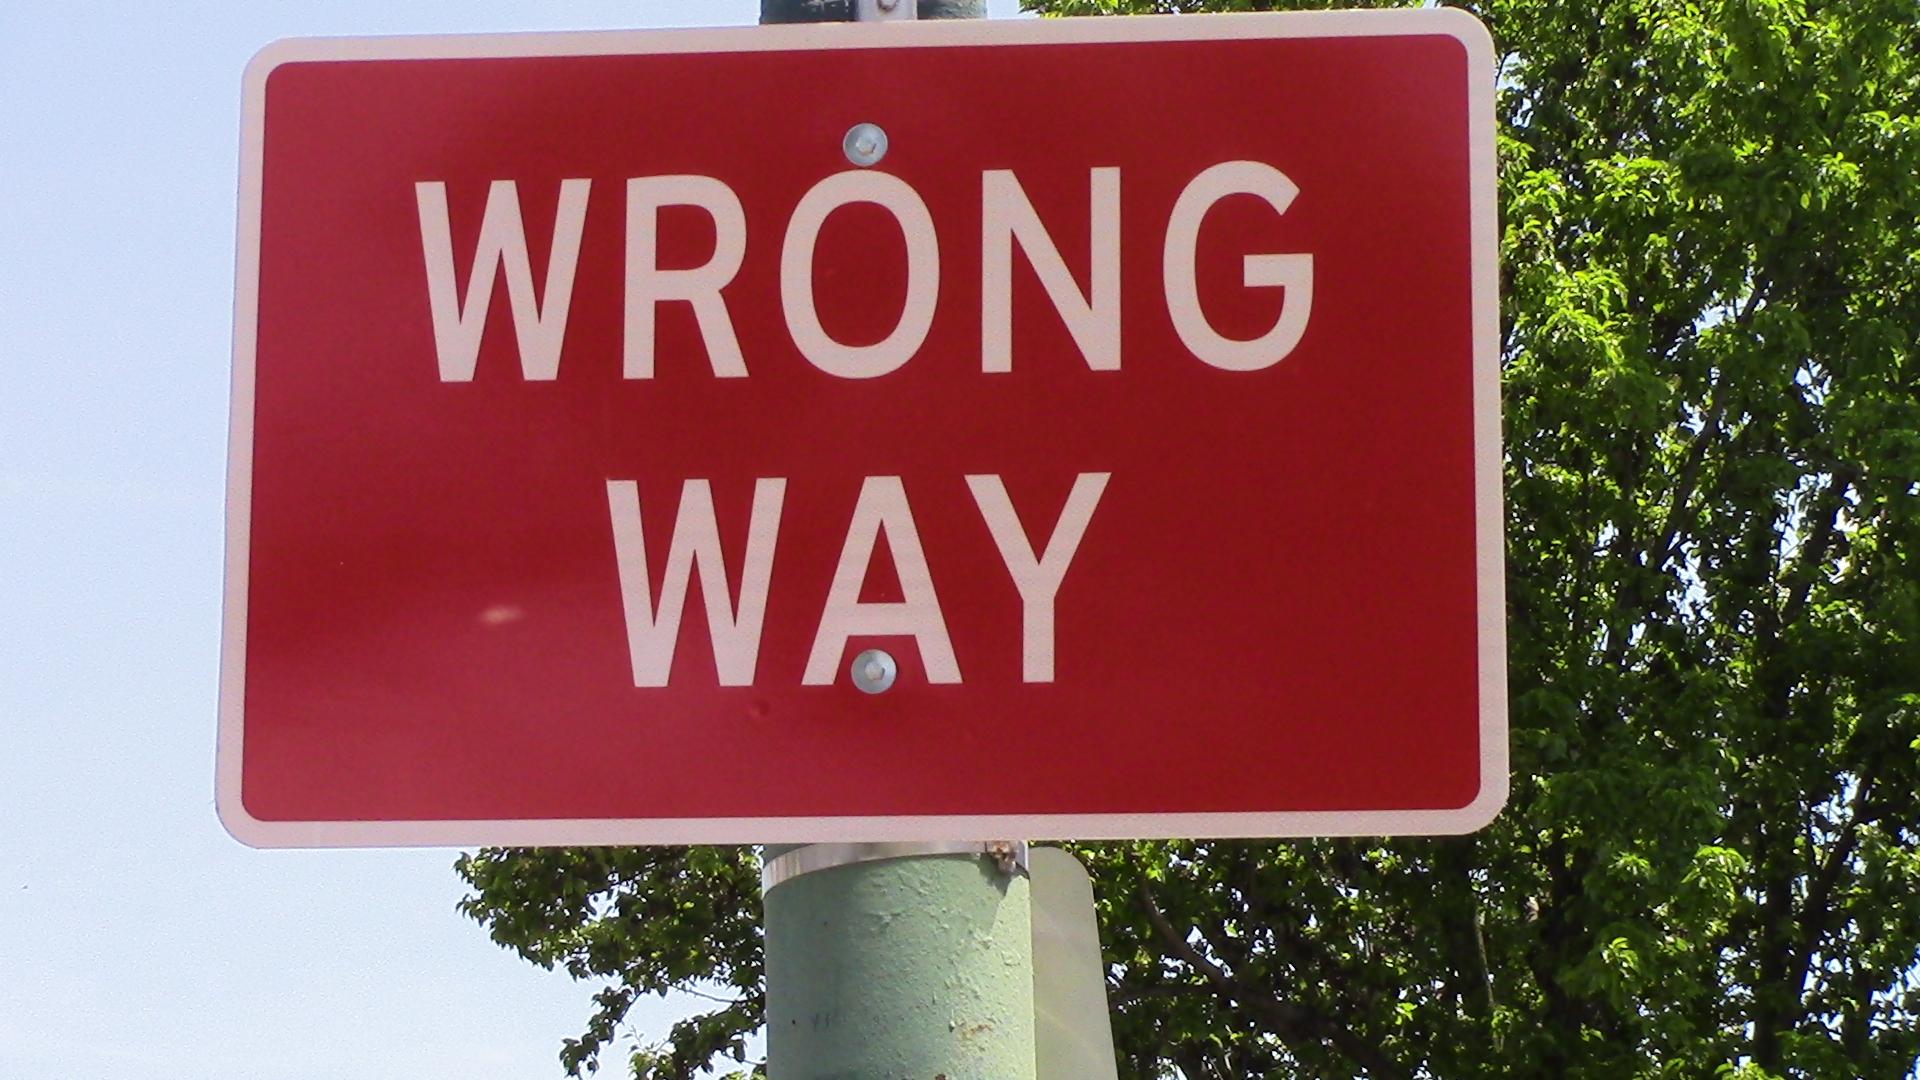 PN - Ryan, wrong way